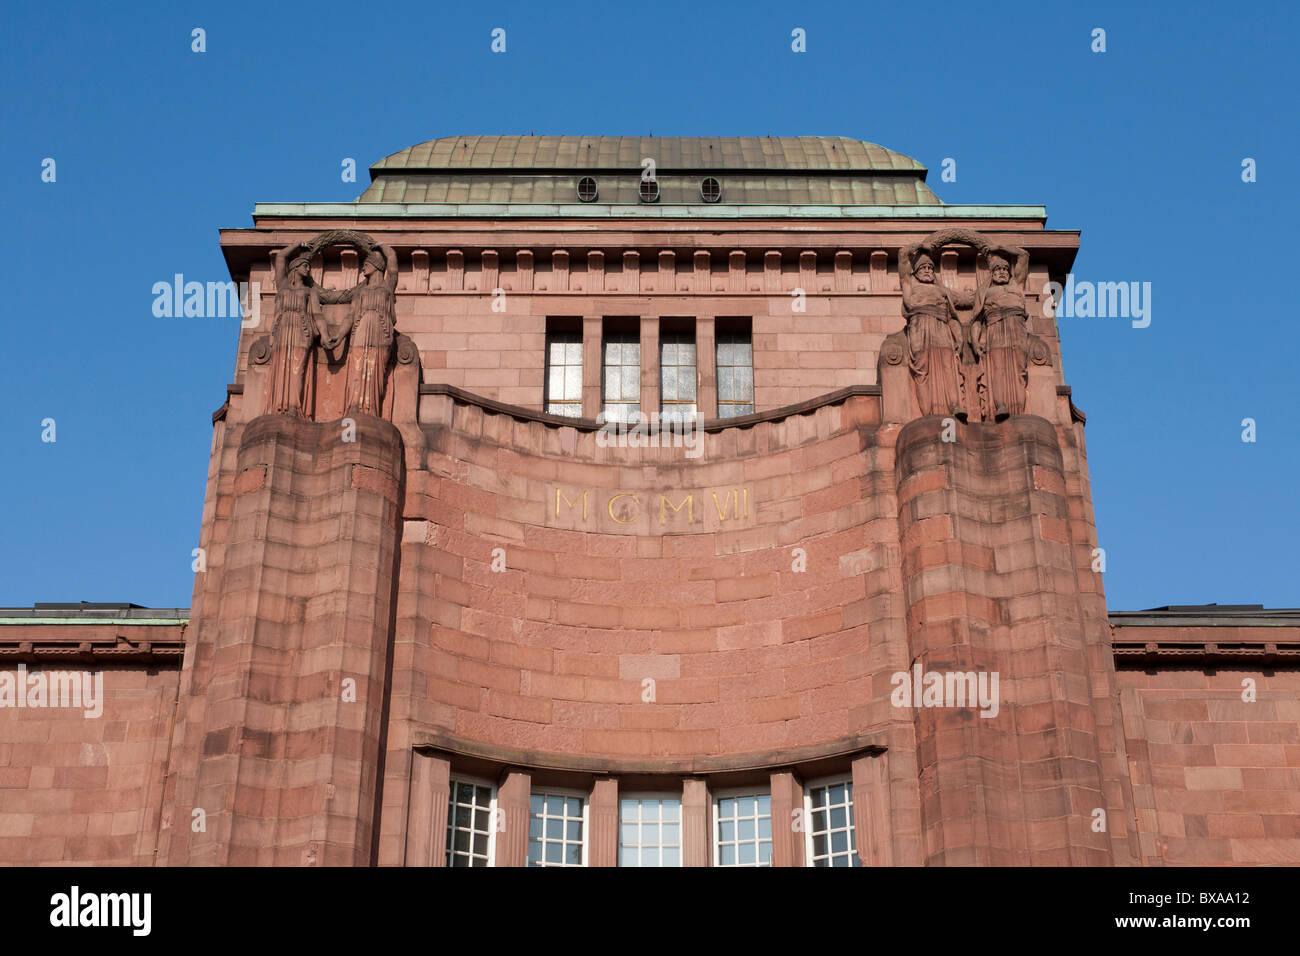 La Kunsthalle, Museo d'arte dal 1907, il museo, Jugendstil, Mannheim, BADEN-WUERTTEMBERG, Germania Immagini Stock